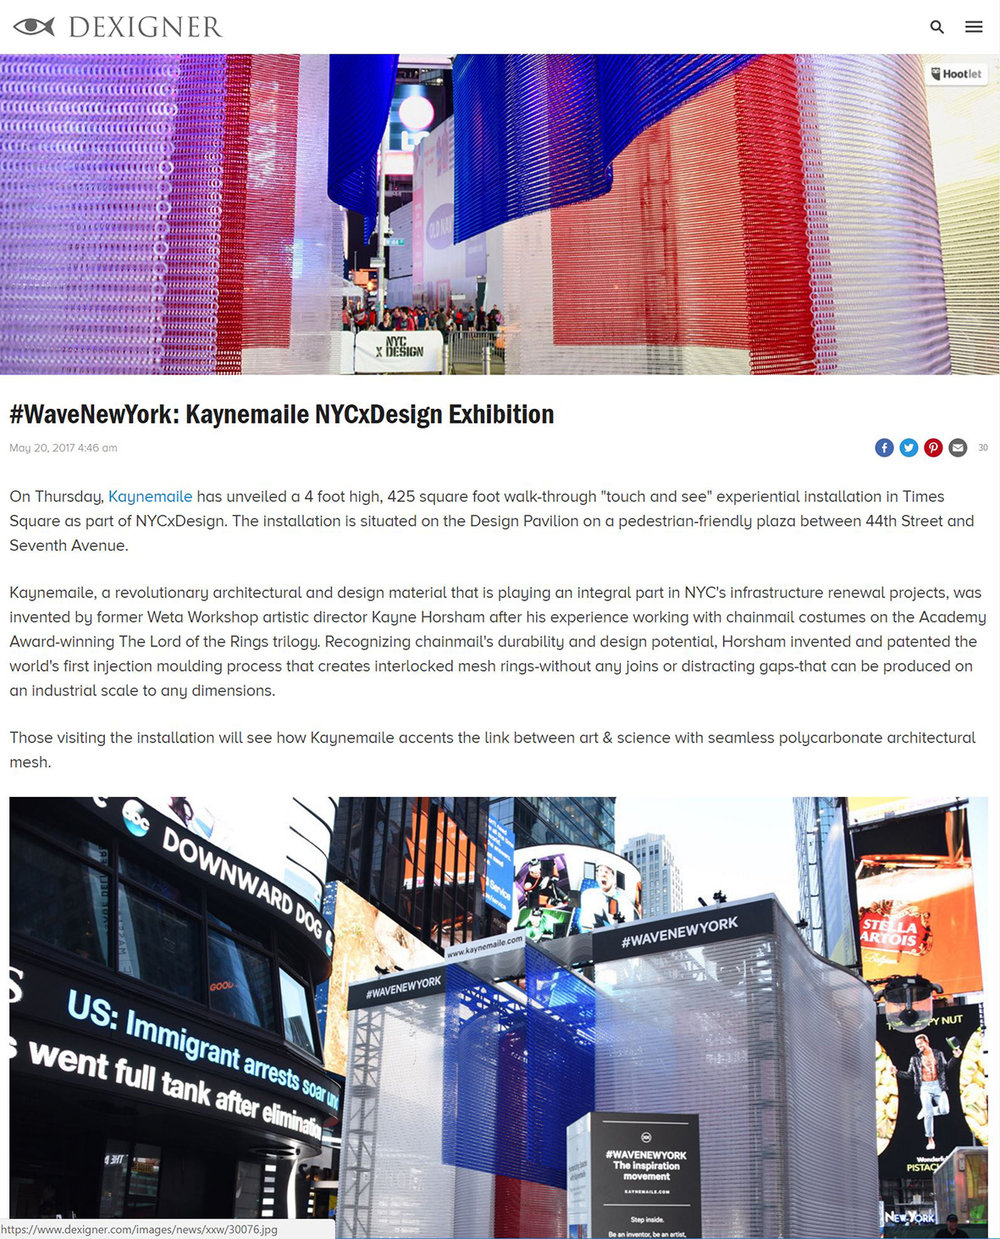 Dexigner: #WaveNewYork: Kaynemaile NYCxDesign Exhibition